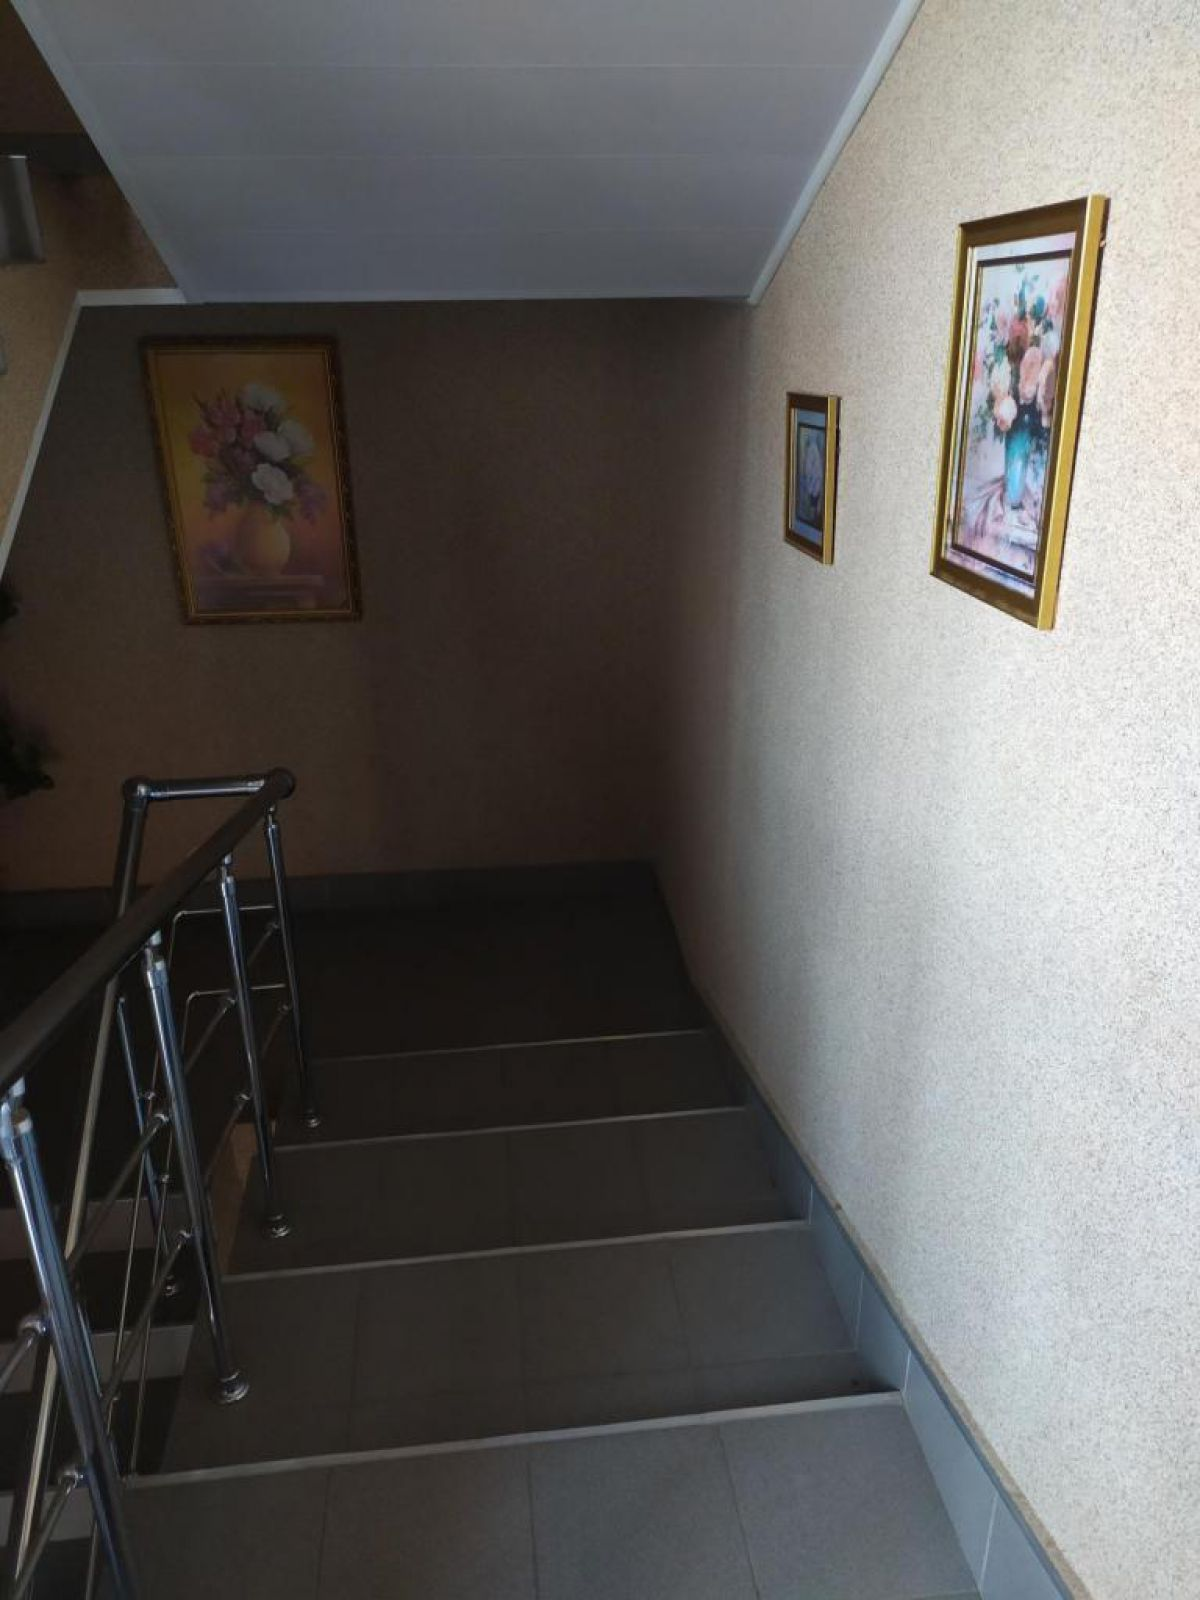 Таунхаус в аренду по адресу Россия, Краснодарский край, Краснодар, Холмская ул, 2